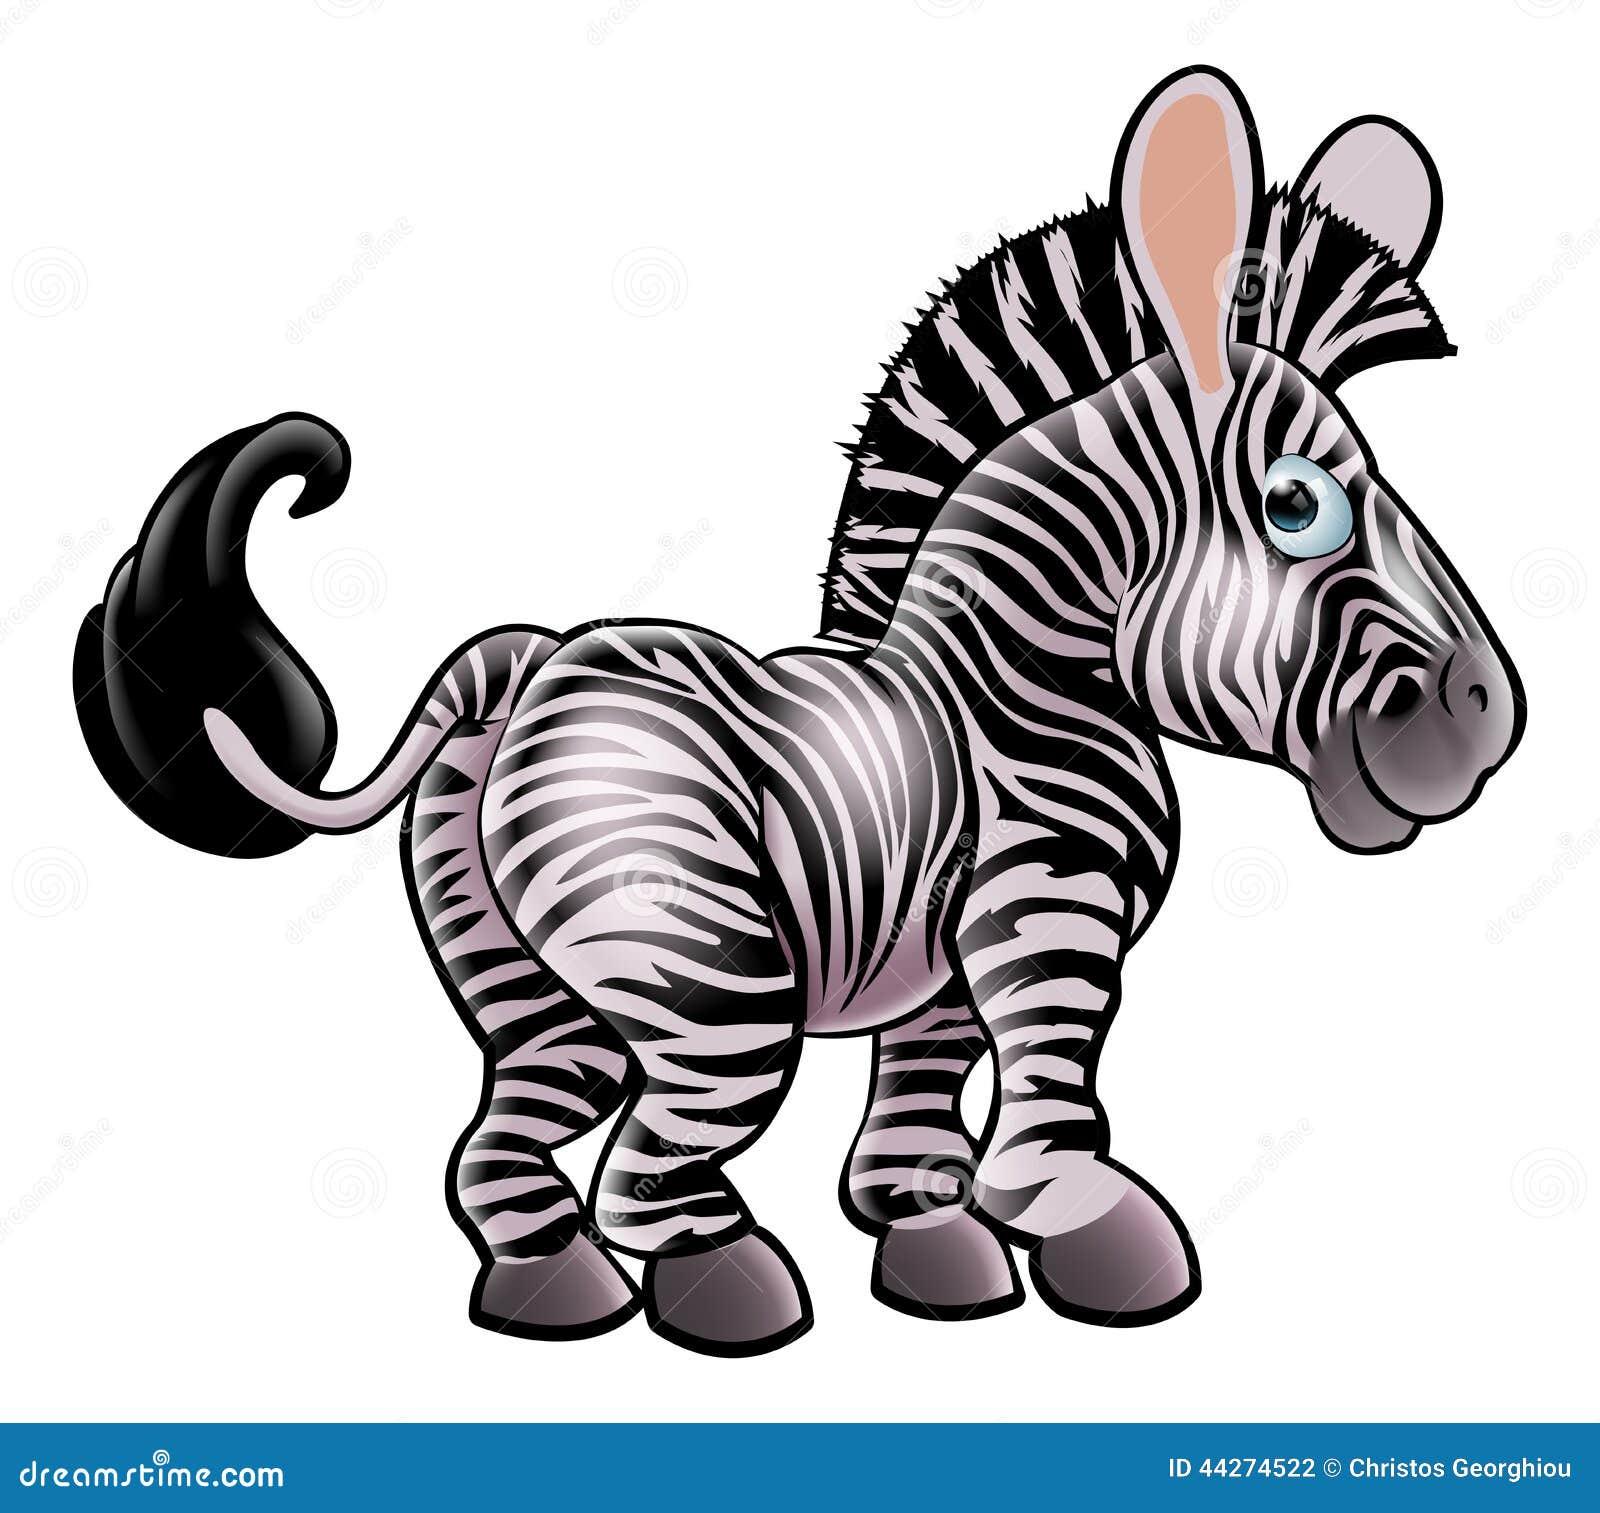 Zebra Baby Clip Art